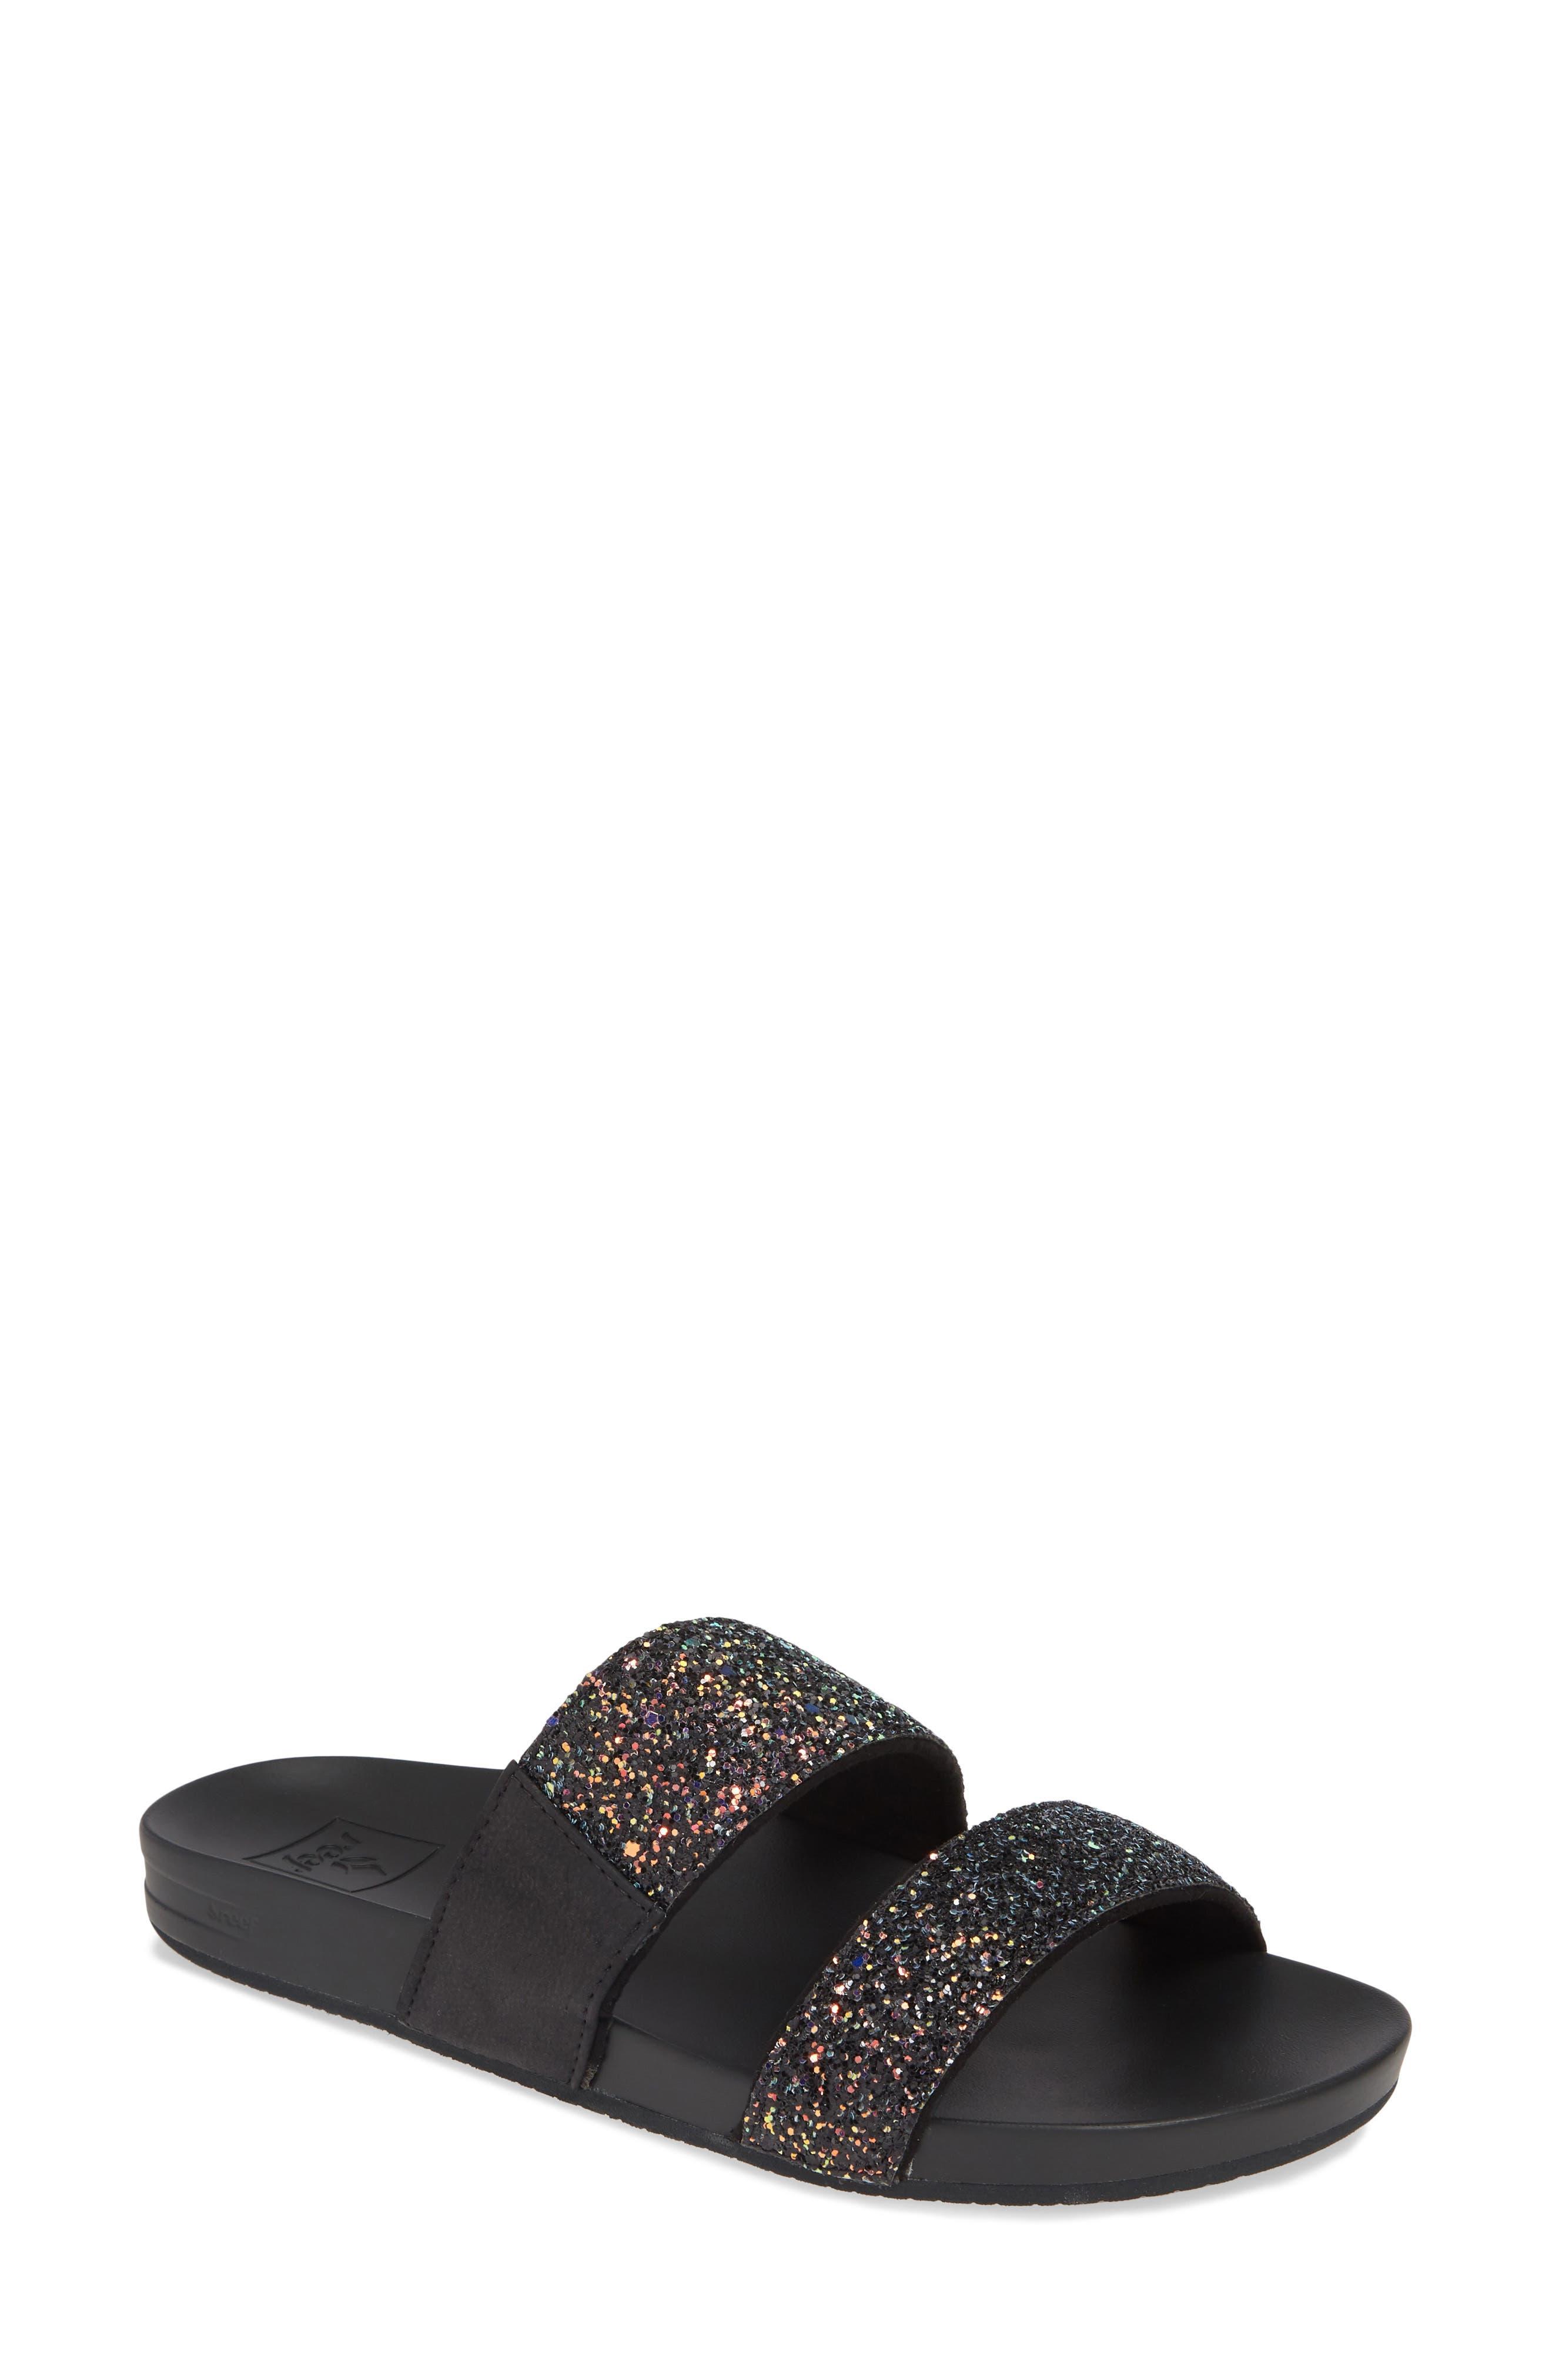 Cushion Bounce Vista Slide Sandal, Main, color, POP ROCKS